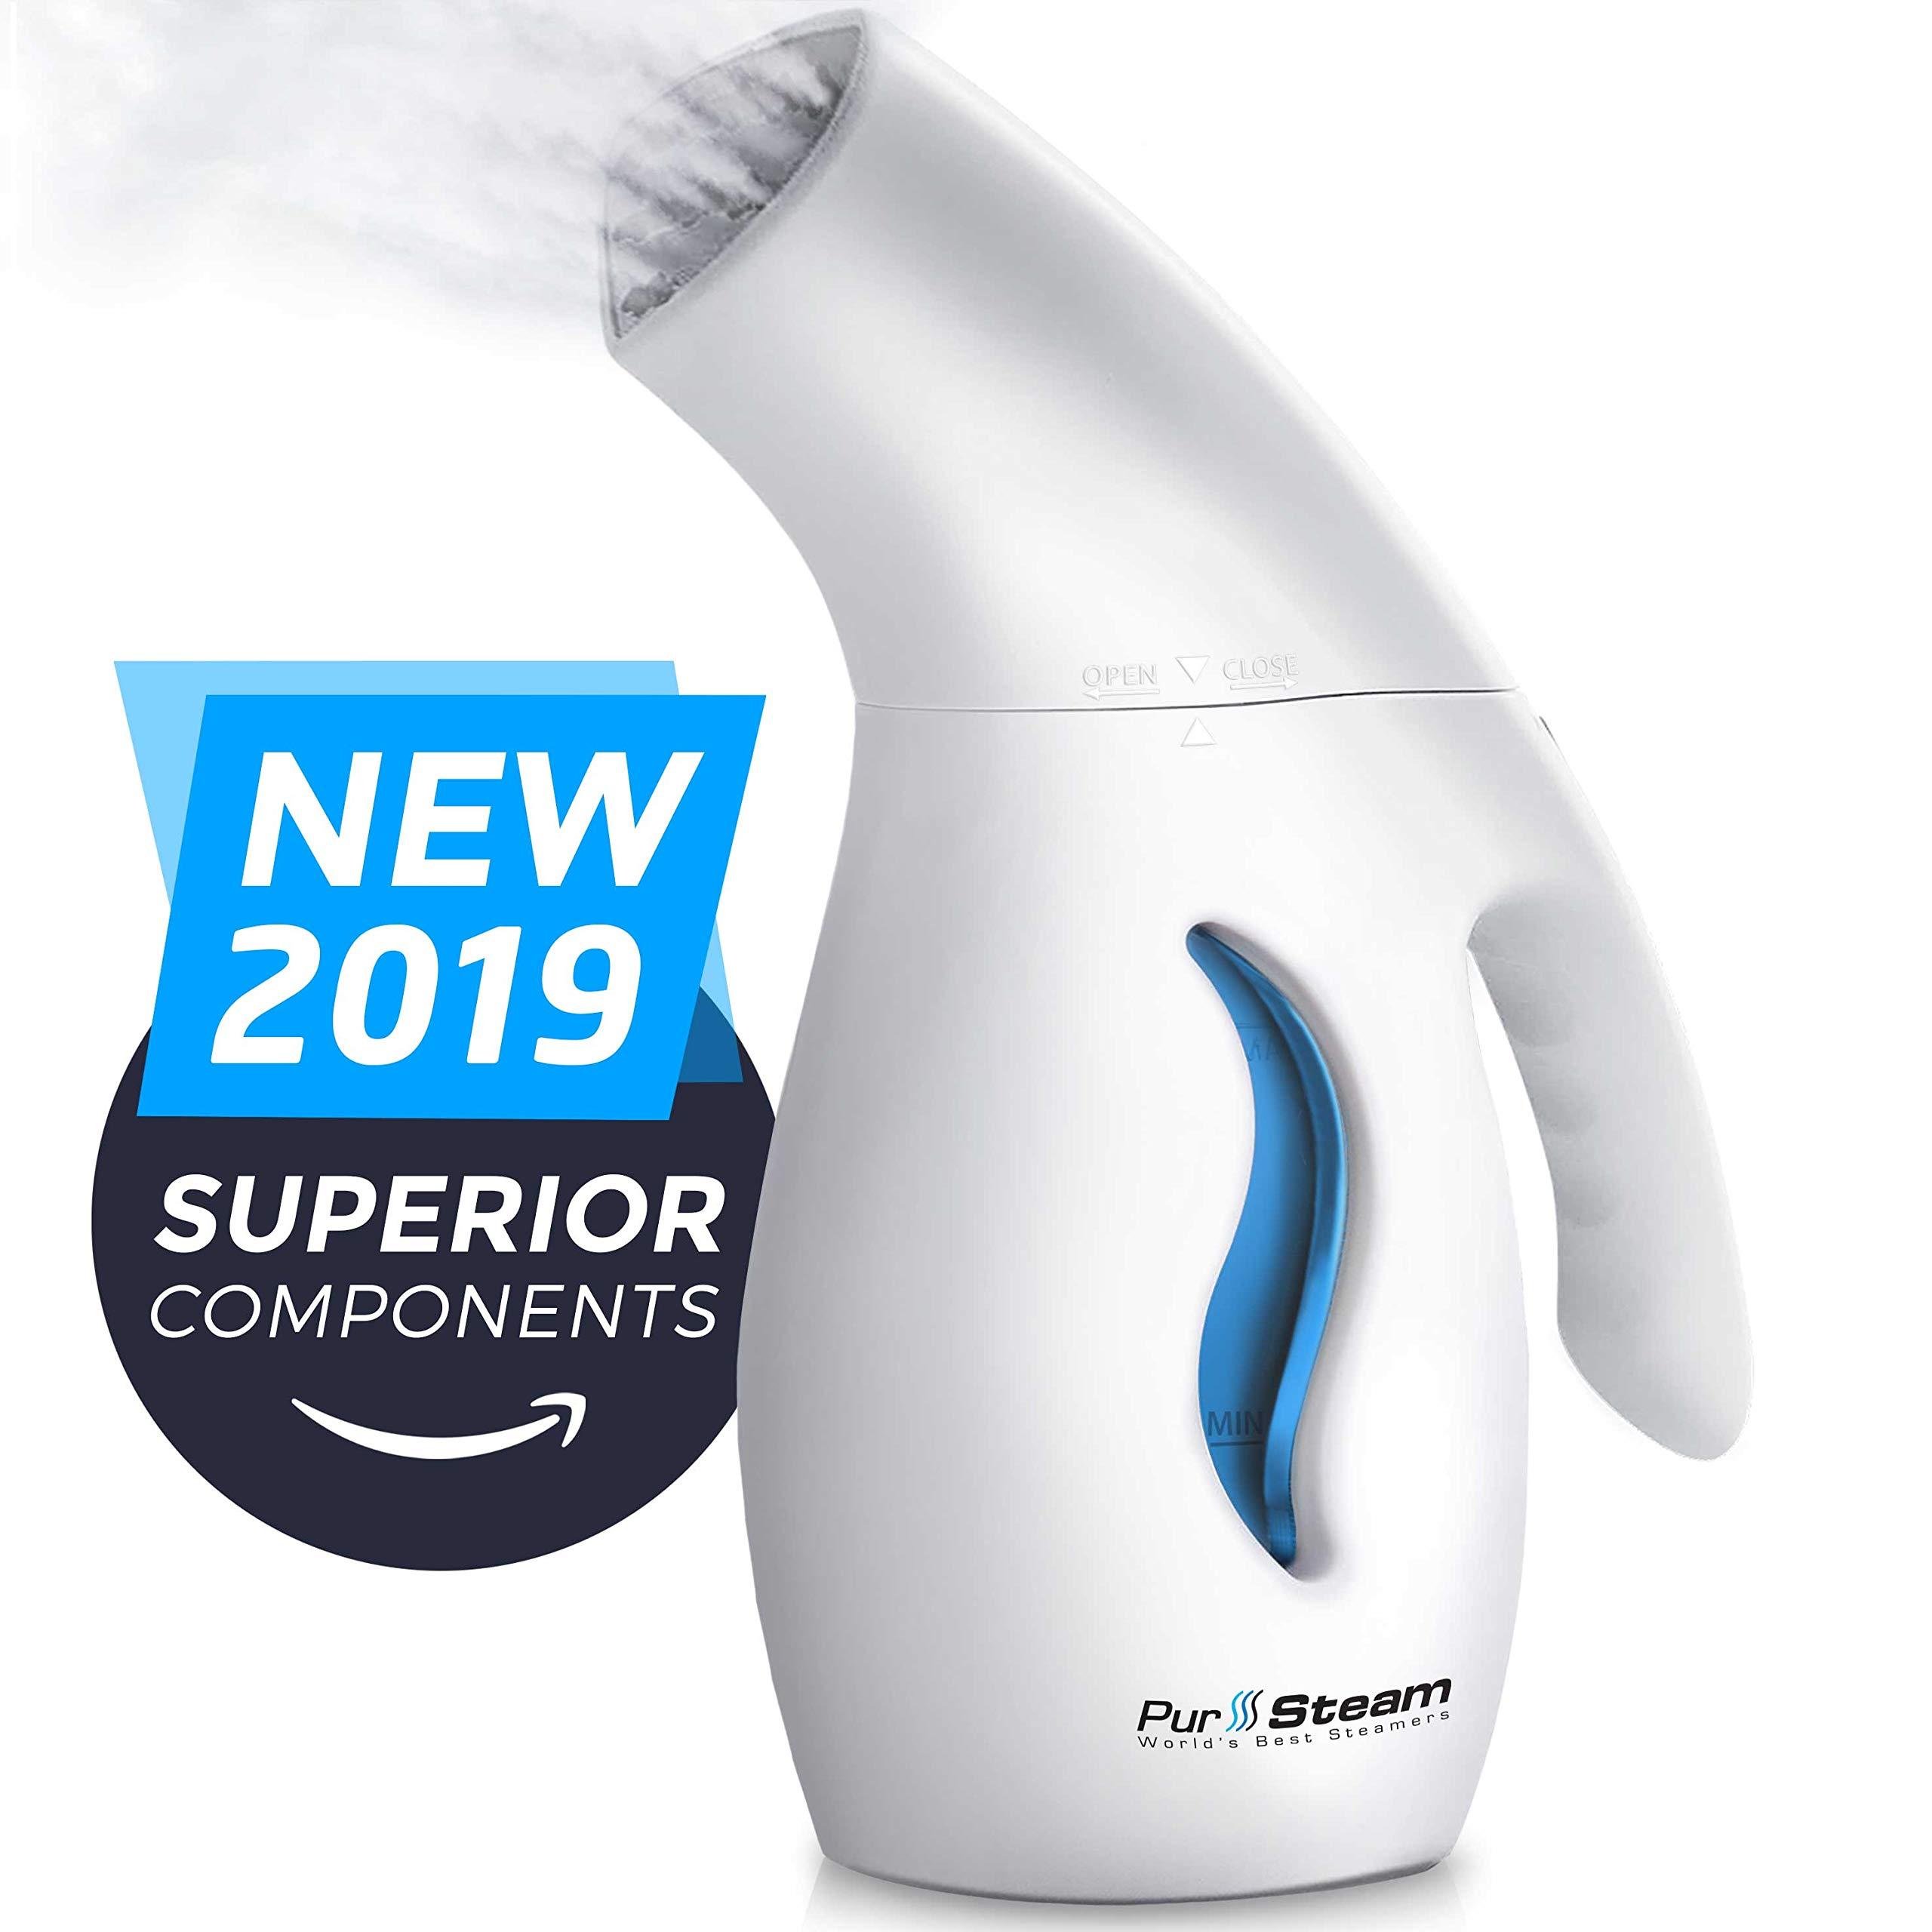 PurSteam Powerful Wrinkles Sterilize UltraFast Heat